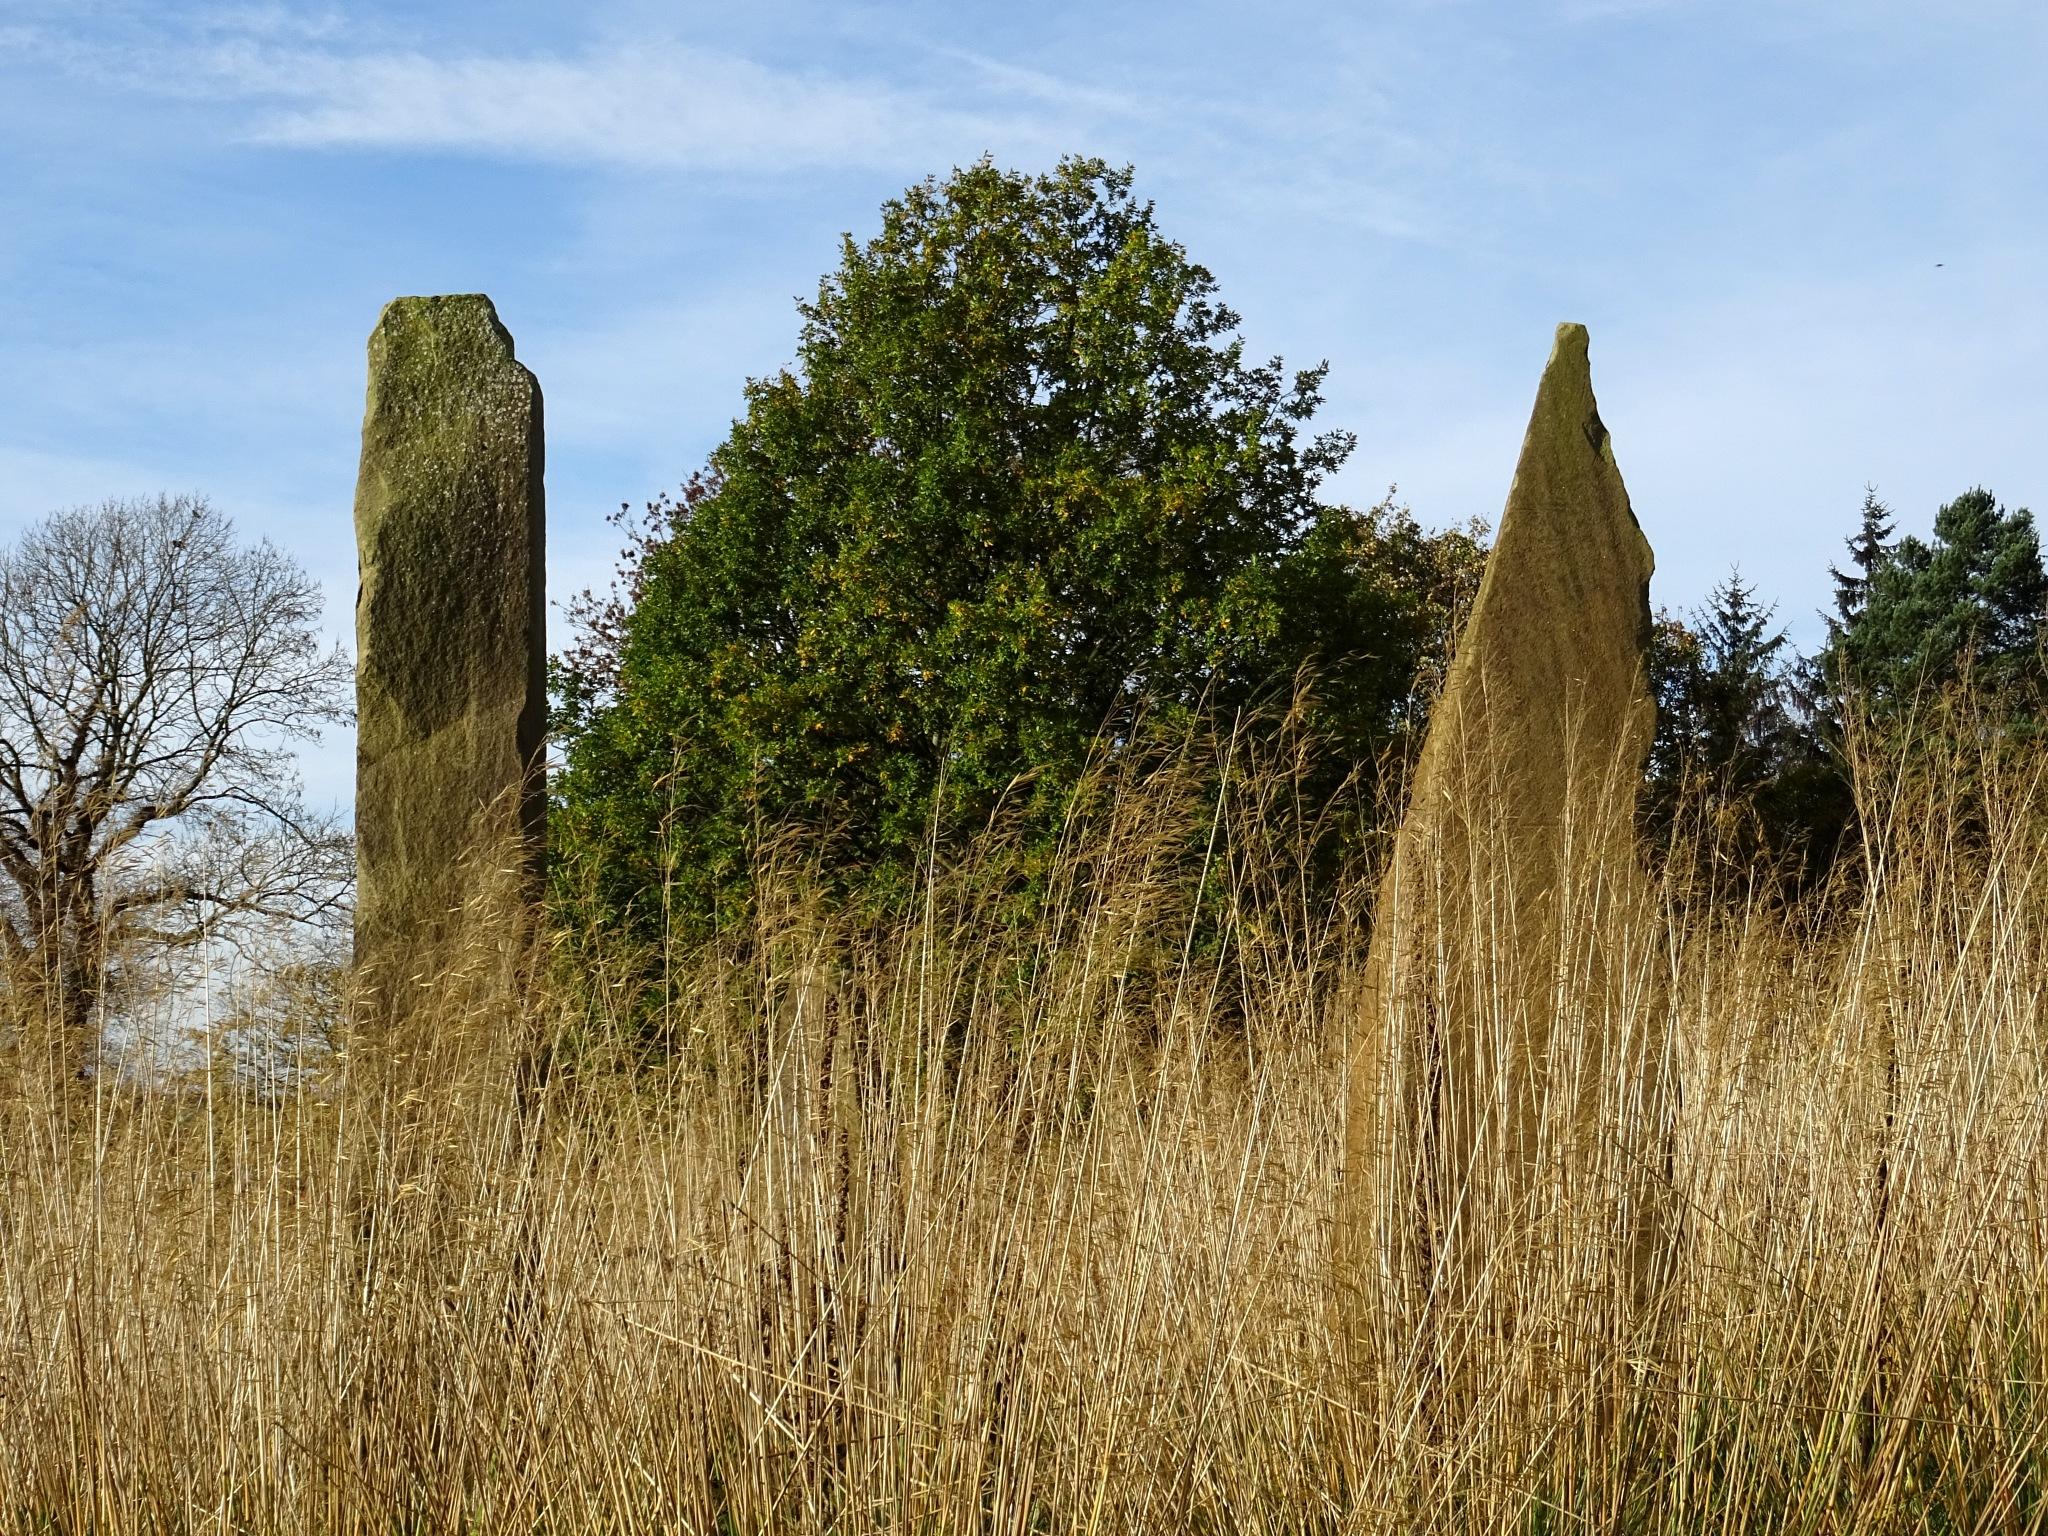 Grass and Stones by kayThornton